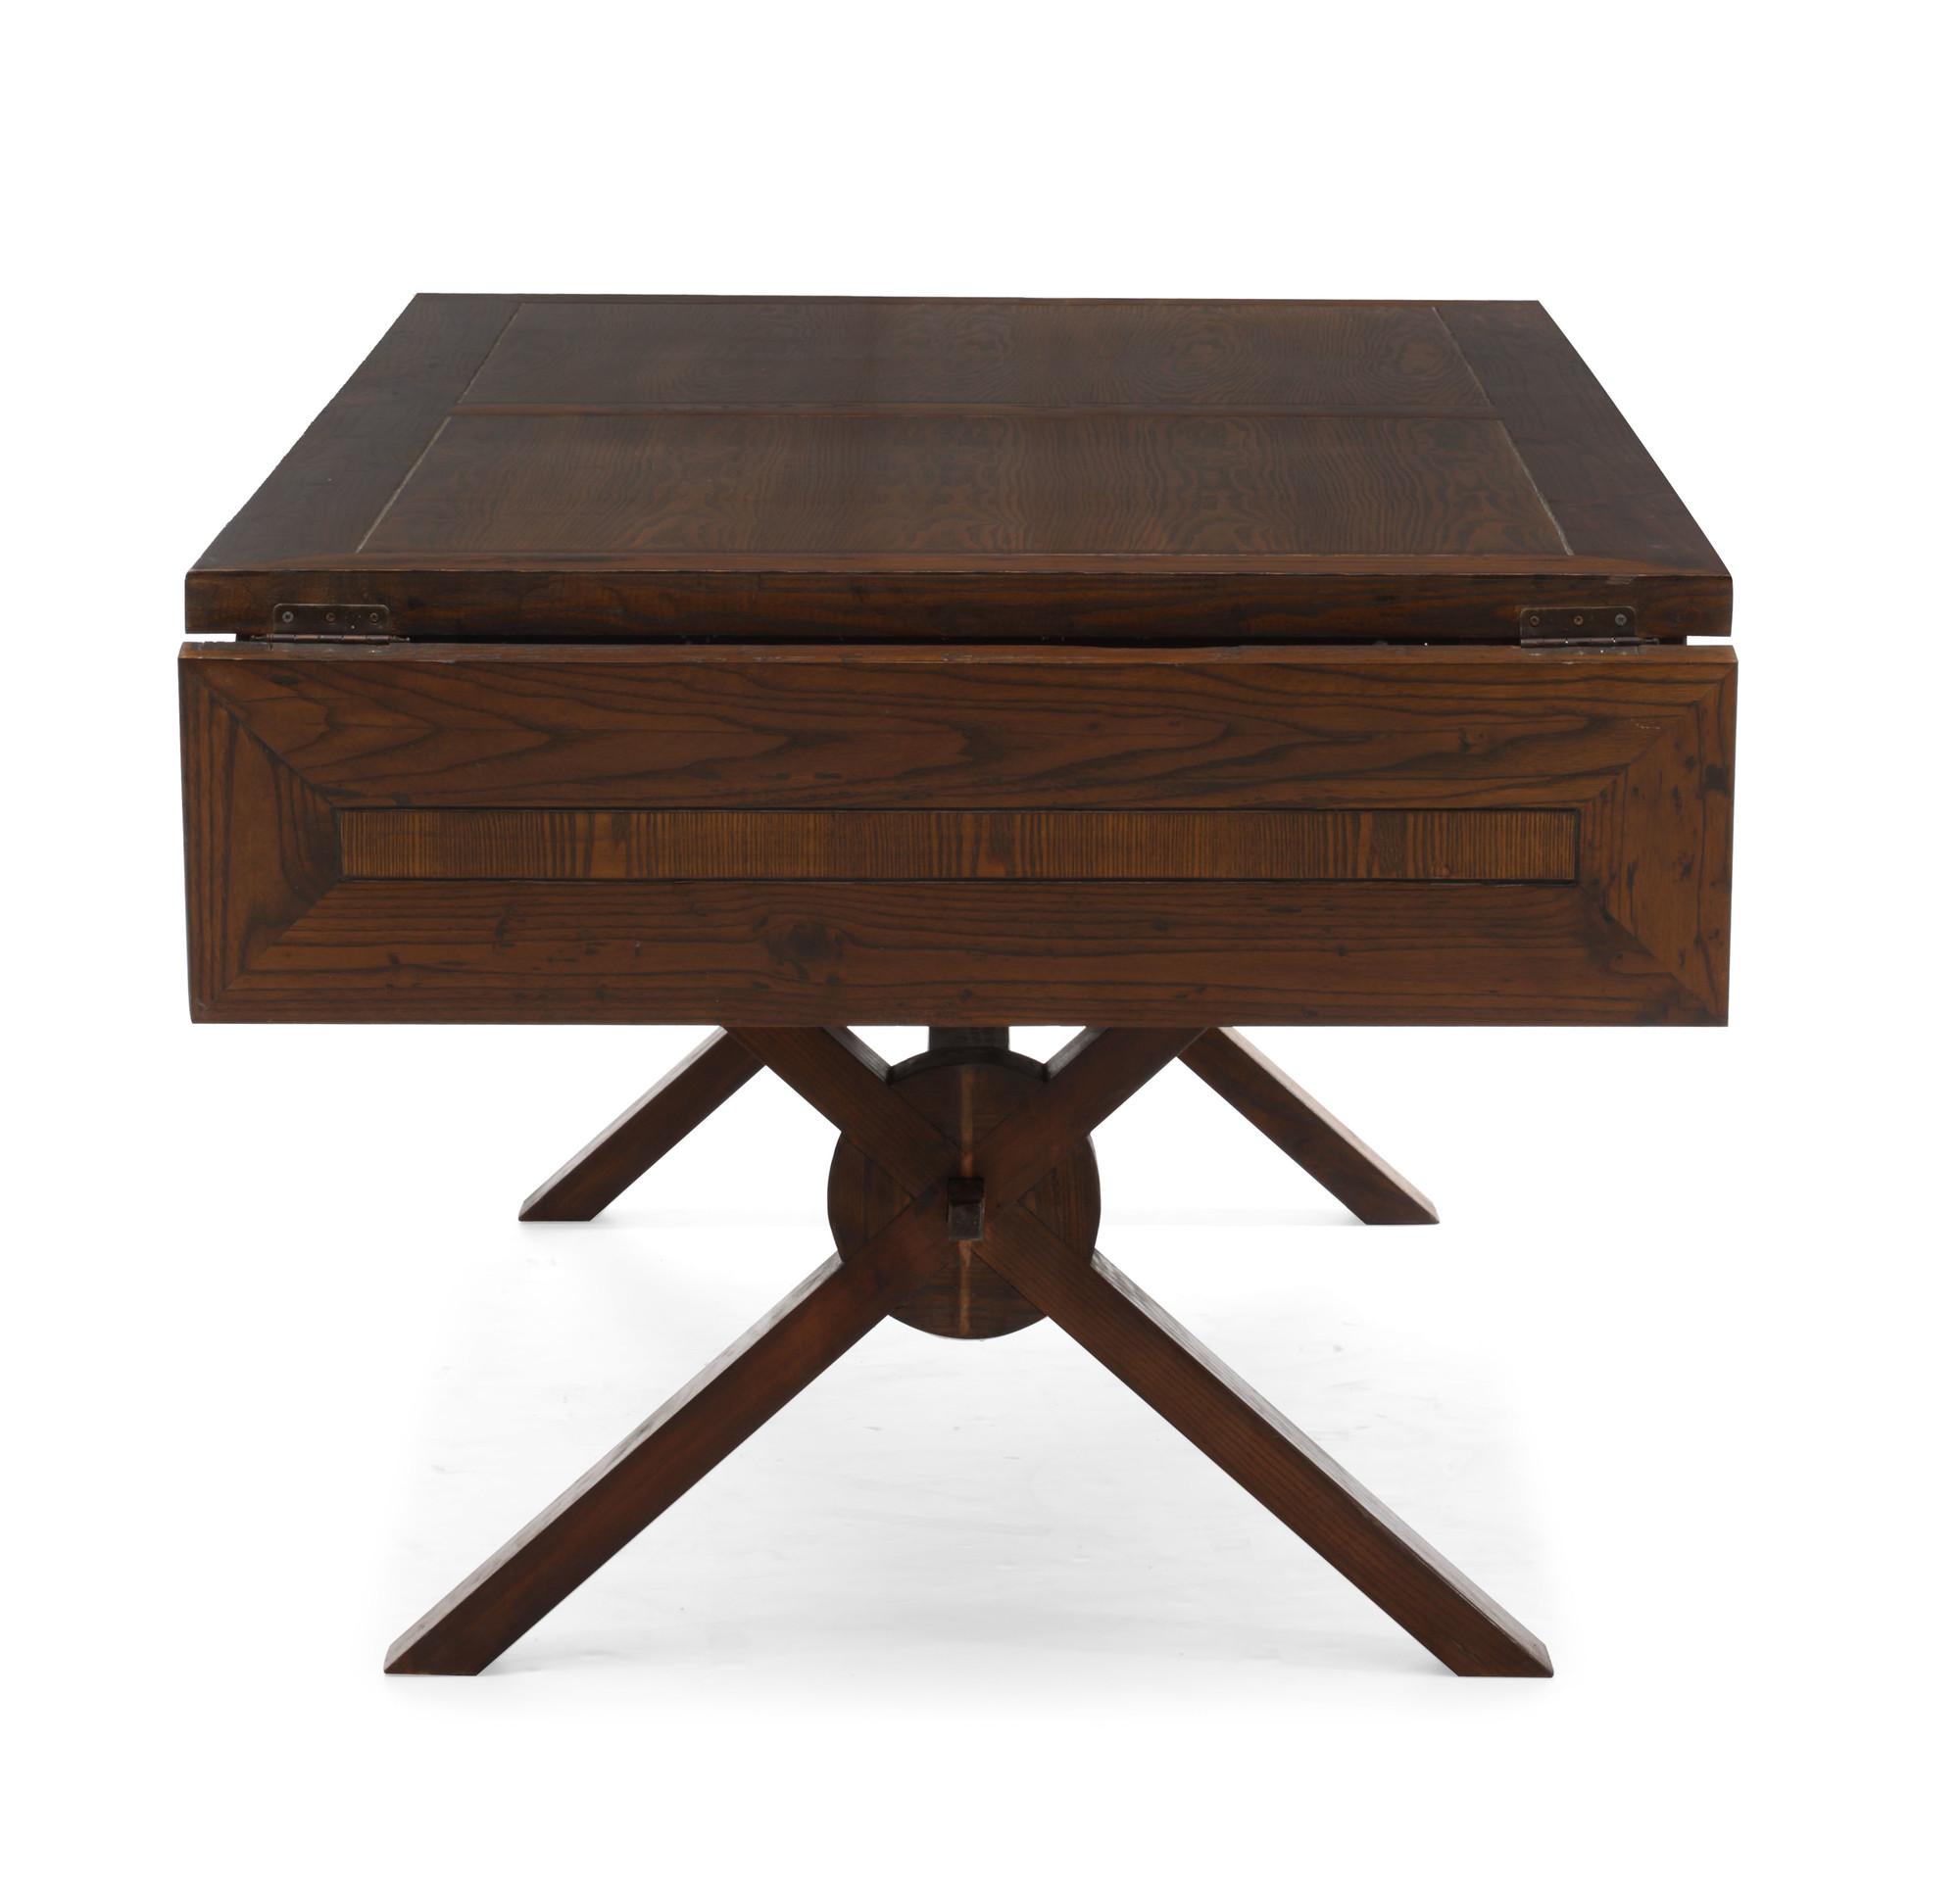 zuo-laurel-heights-table.jpg